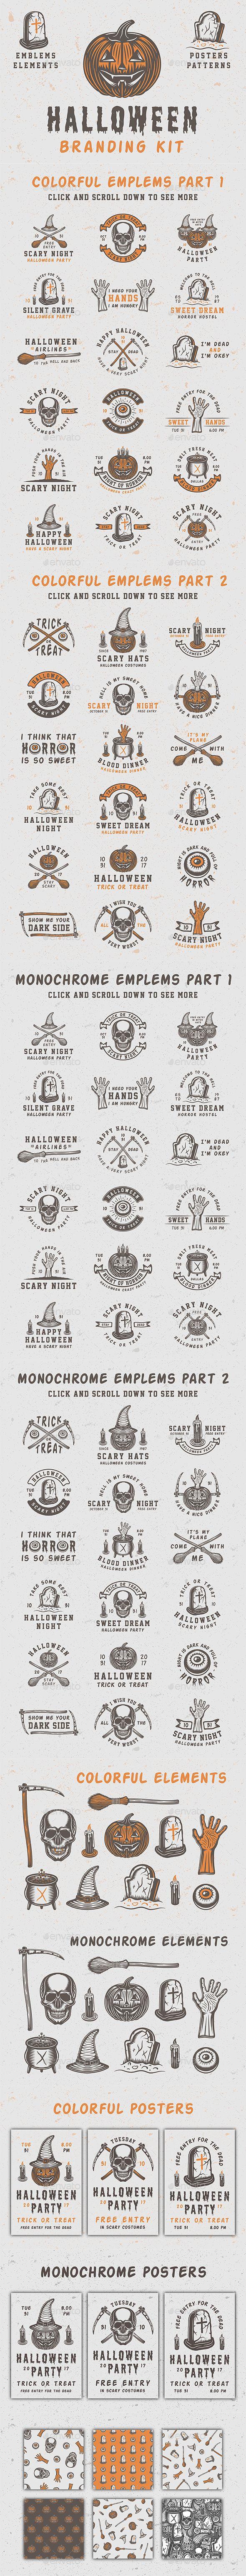 Halloween Branding Kit | Badges, Ai illustrator and Banner template